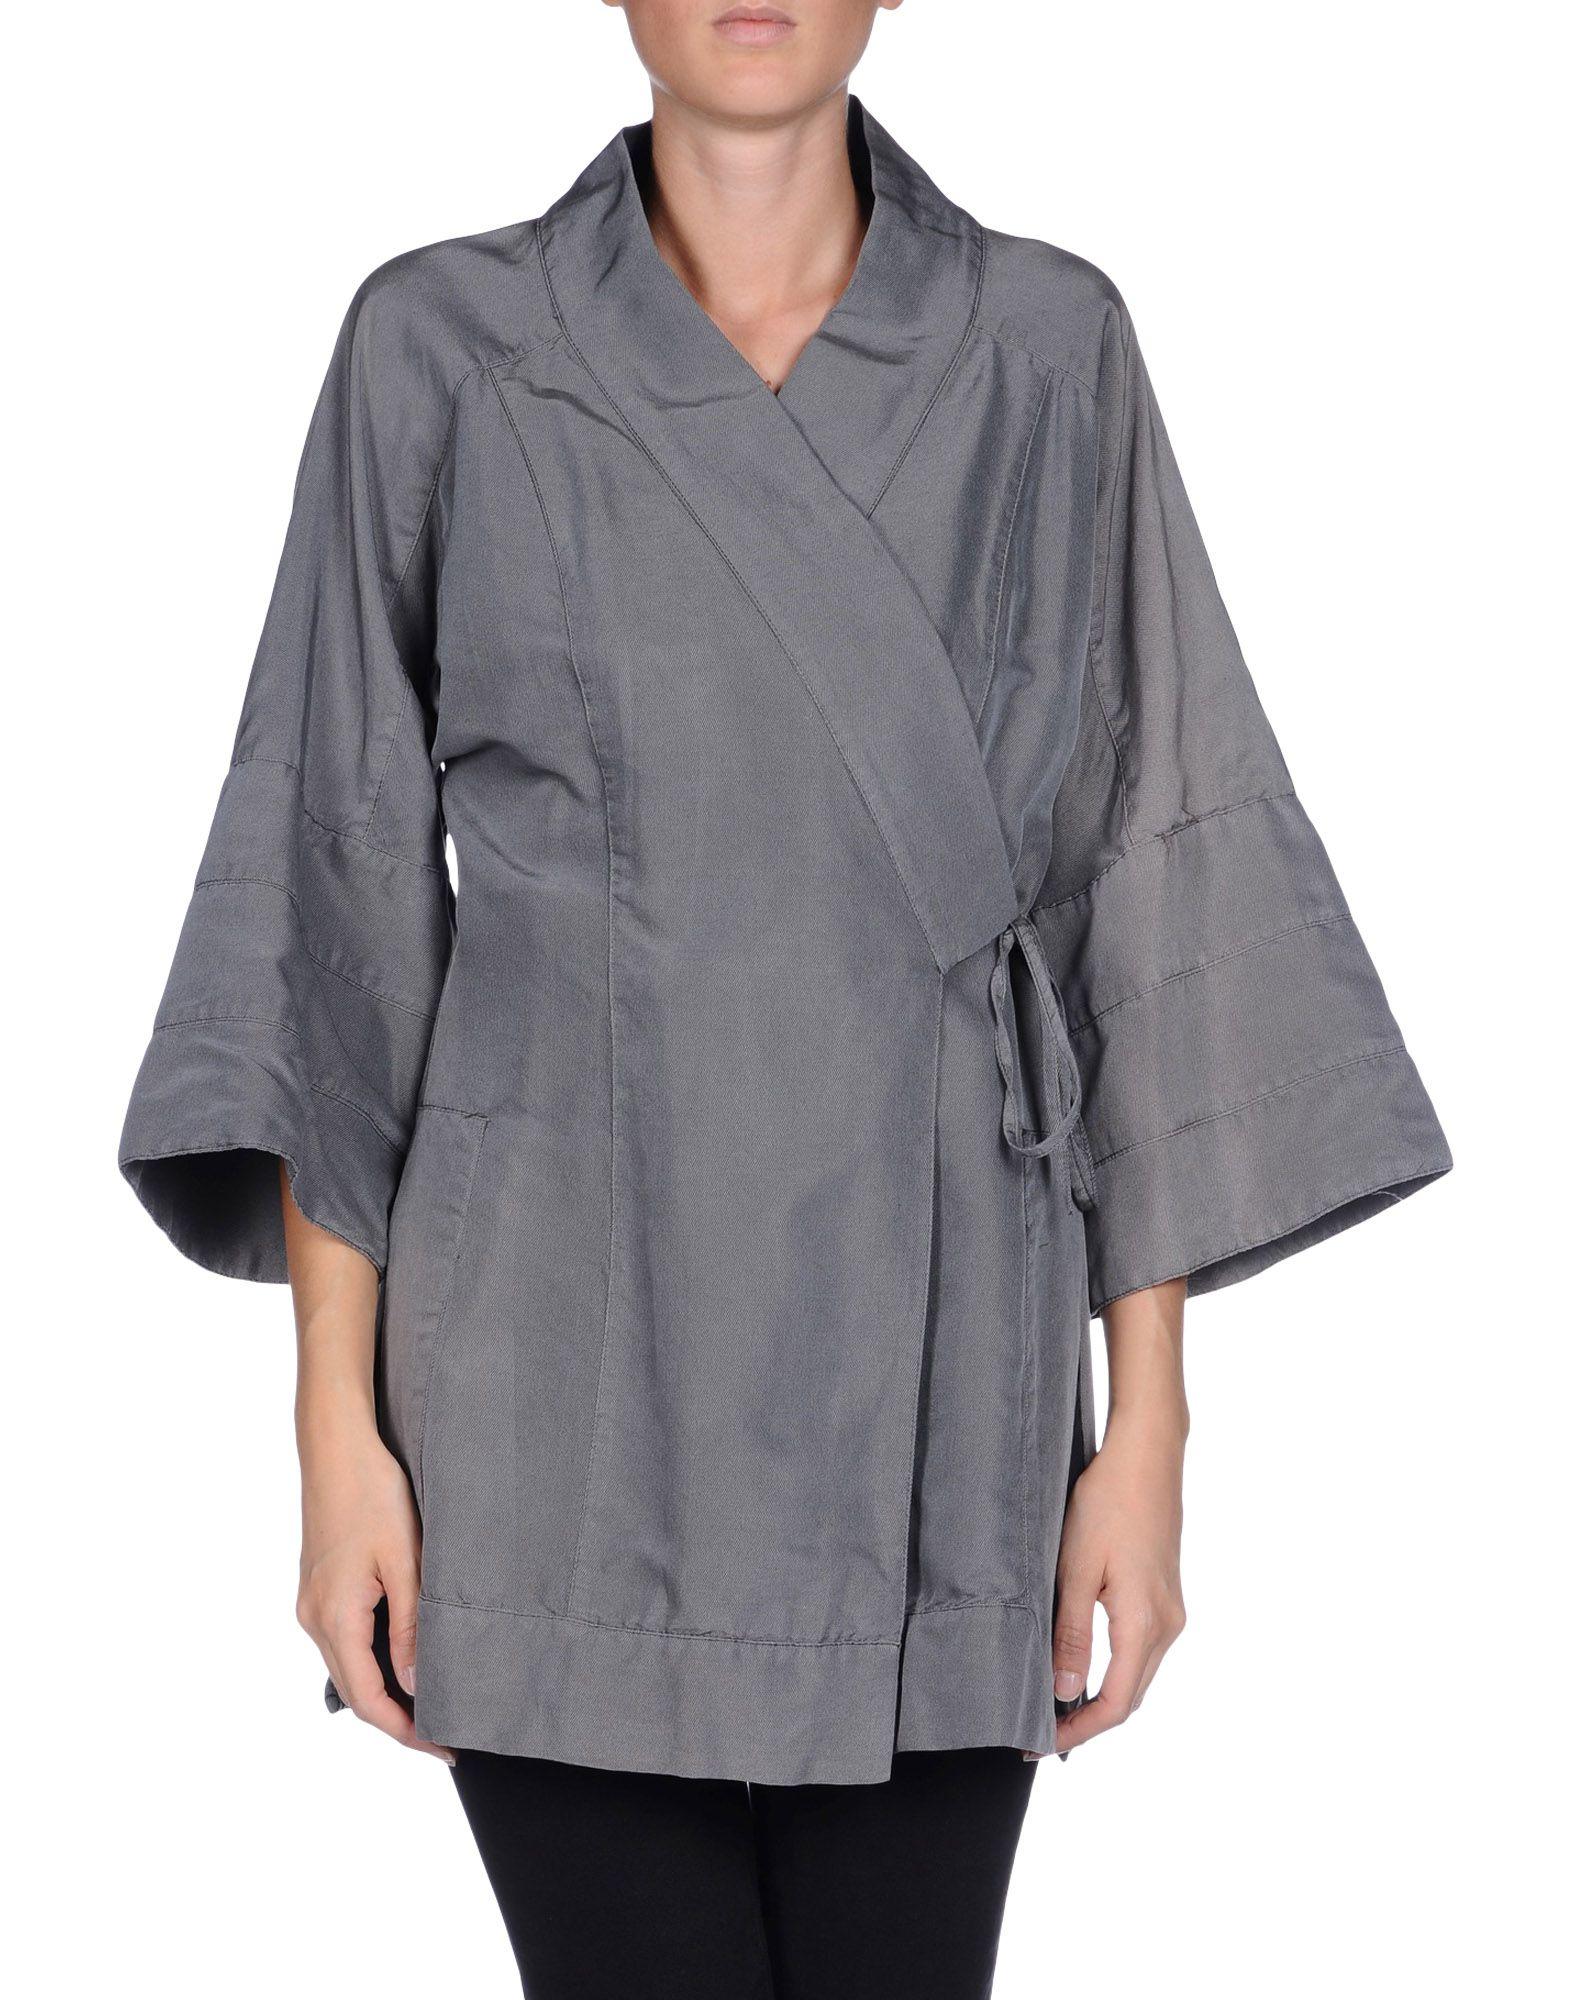 Dondup Full-length Jacket in Gray